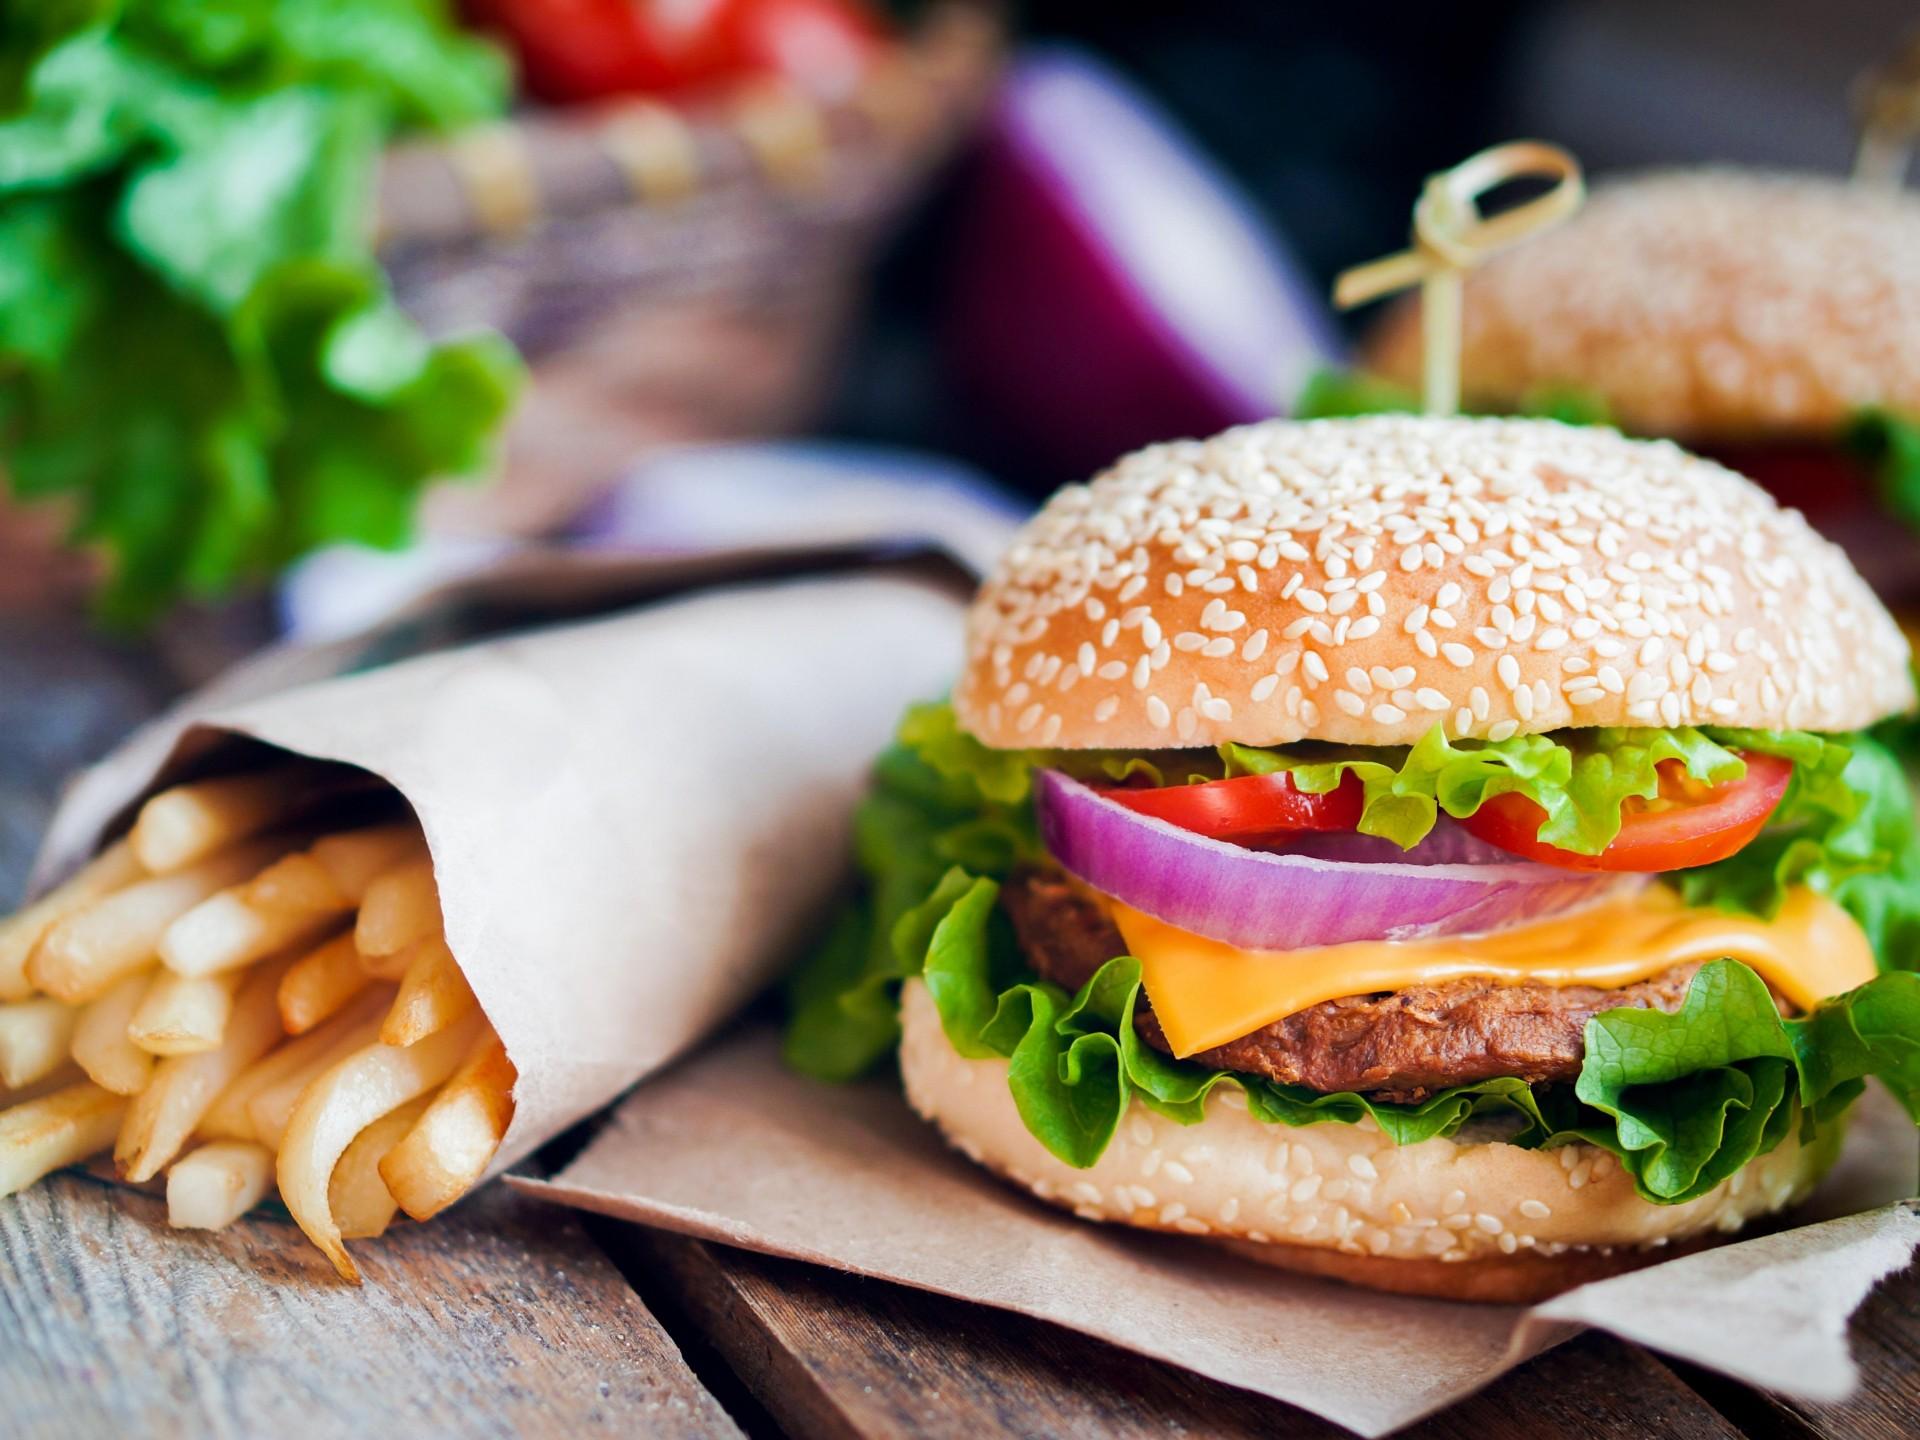 Gourmet Hamburger Restaurant (Fully Licensed) Rent only $699pw - Sutherland Shir